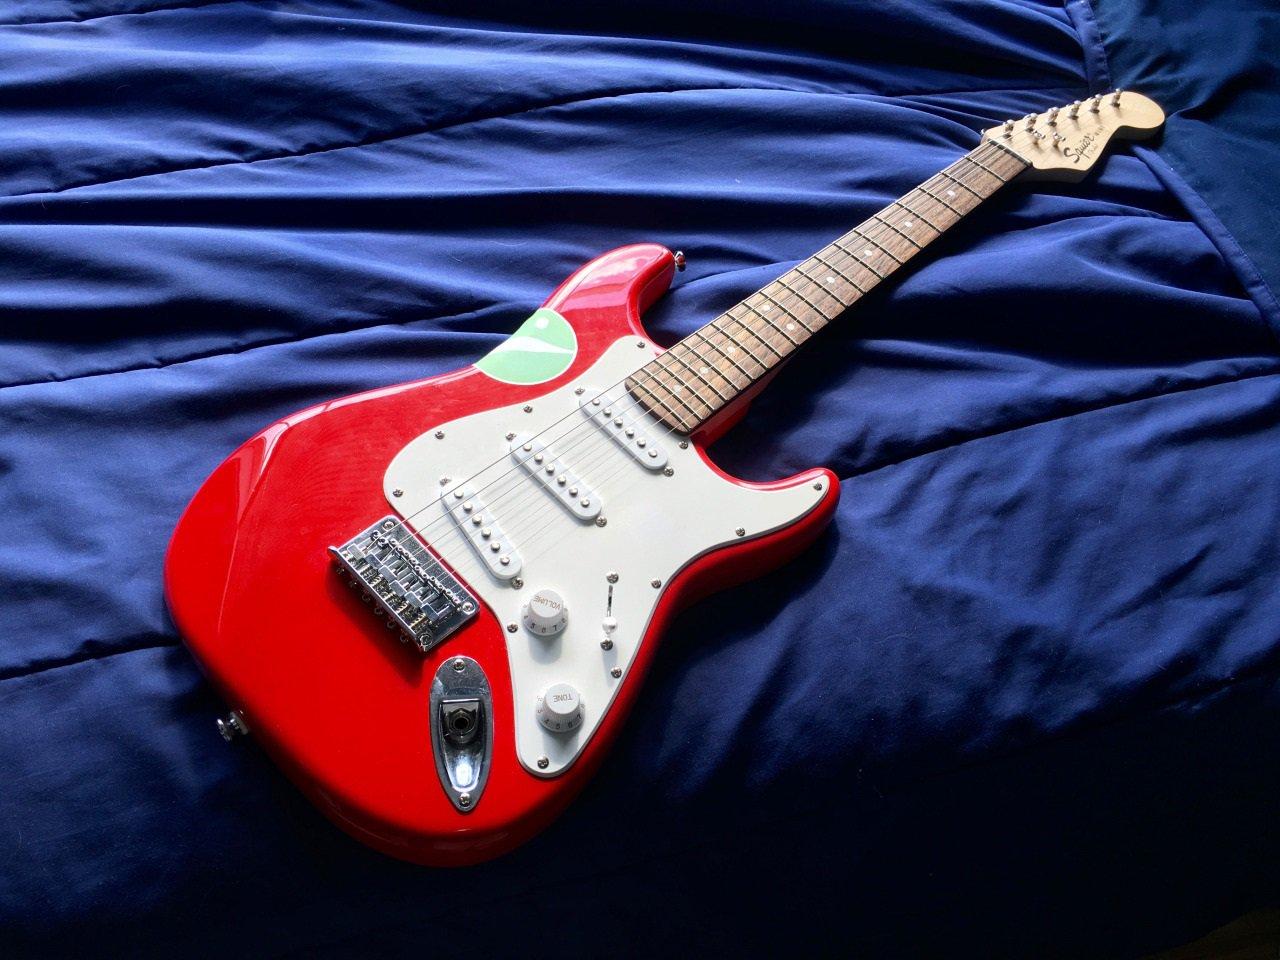 ...a guitarra elétrica...